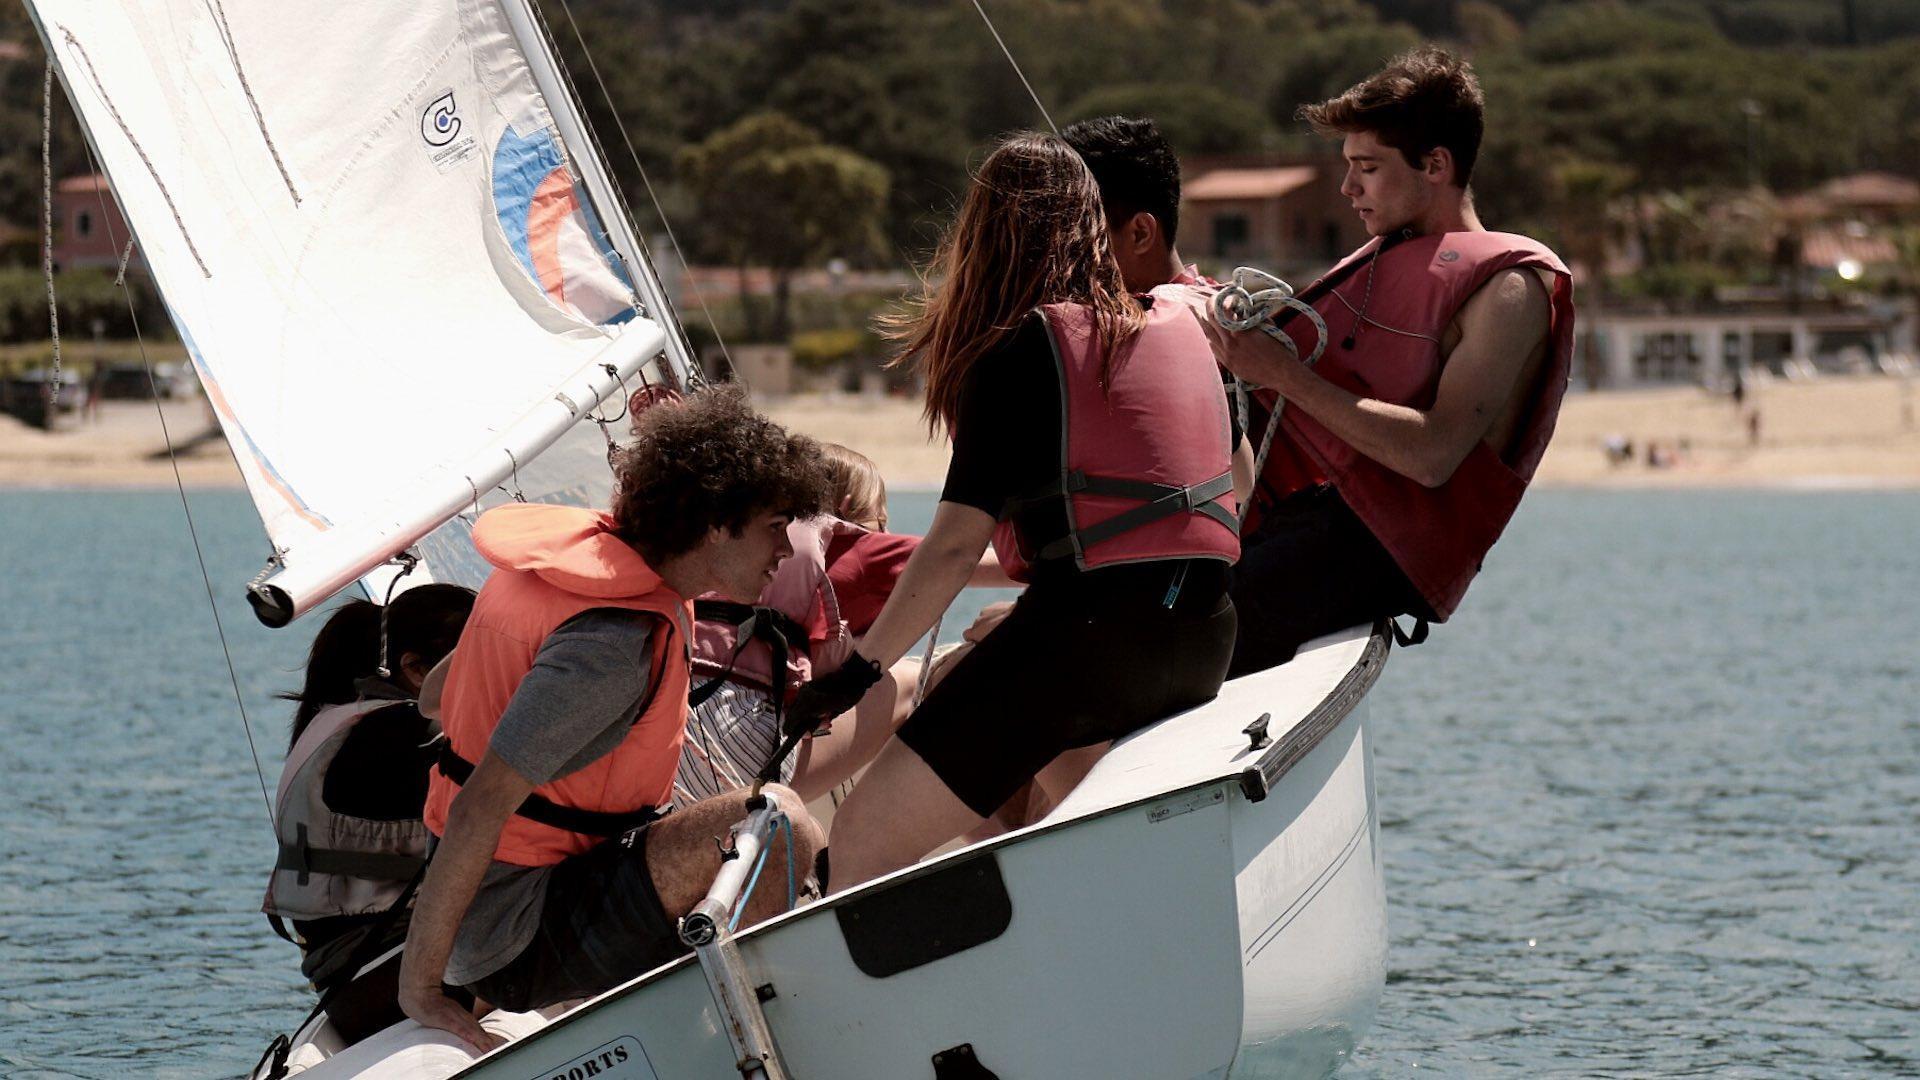 Ragazzi in barca